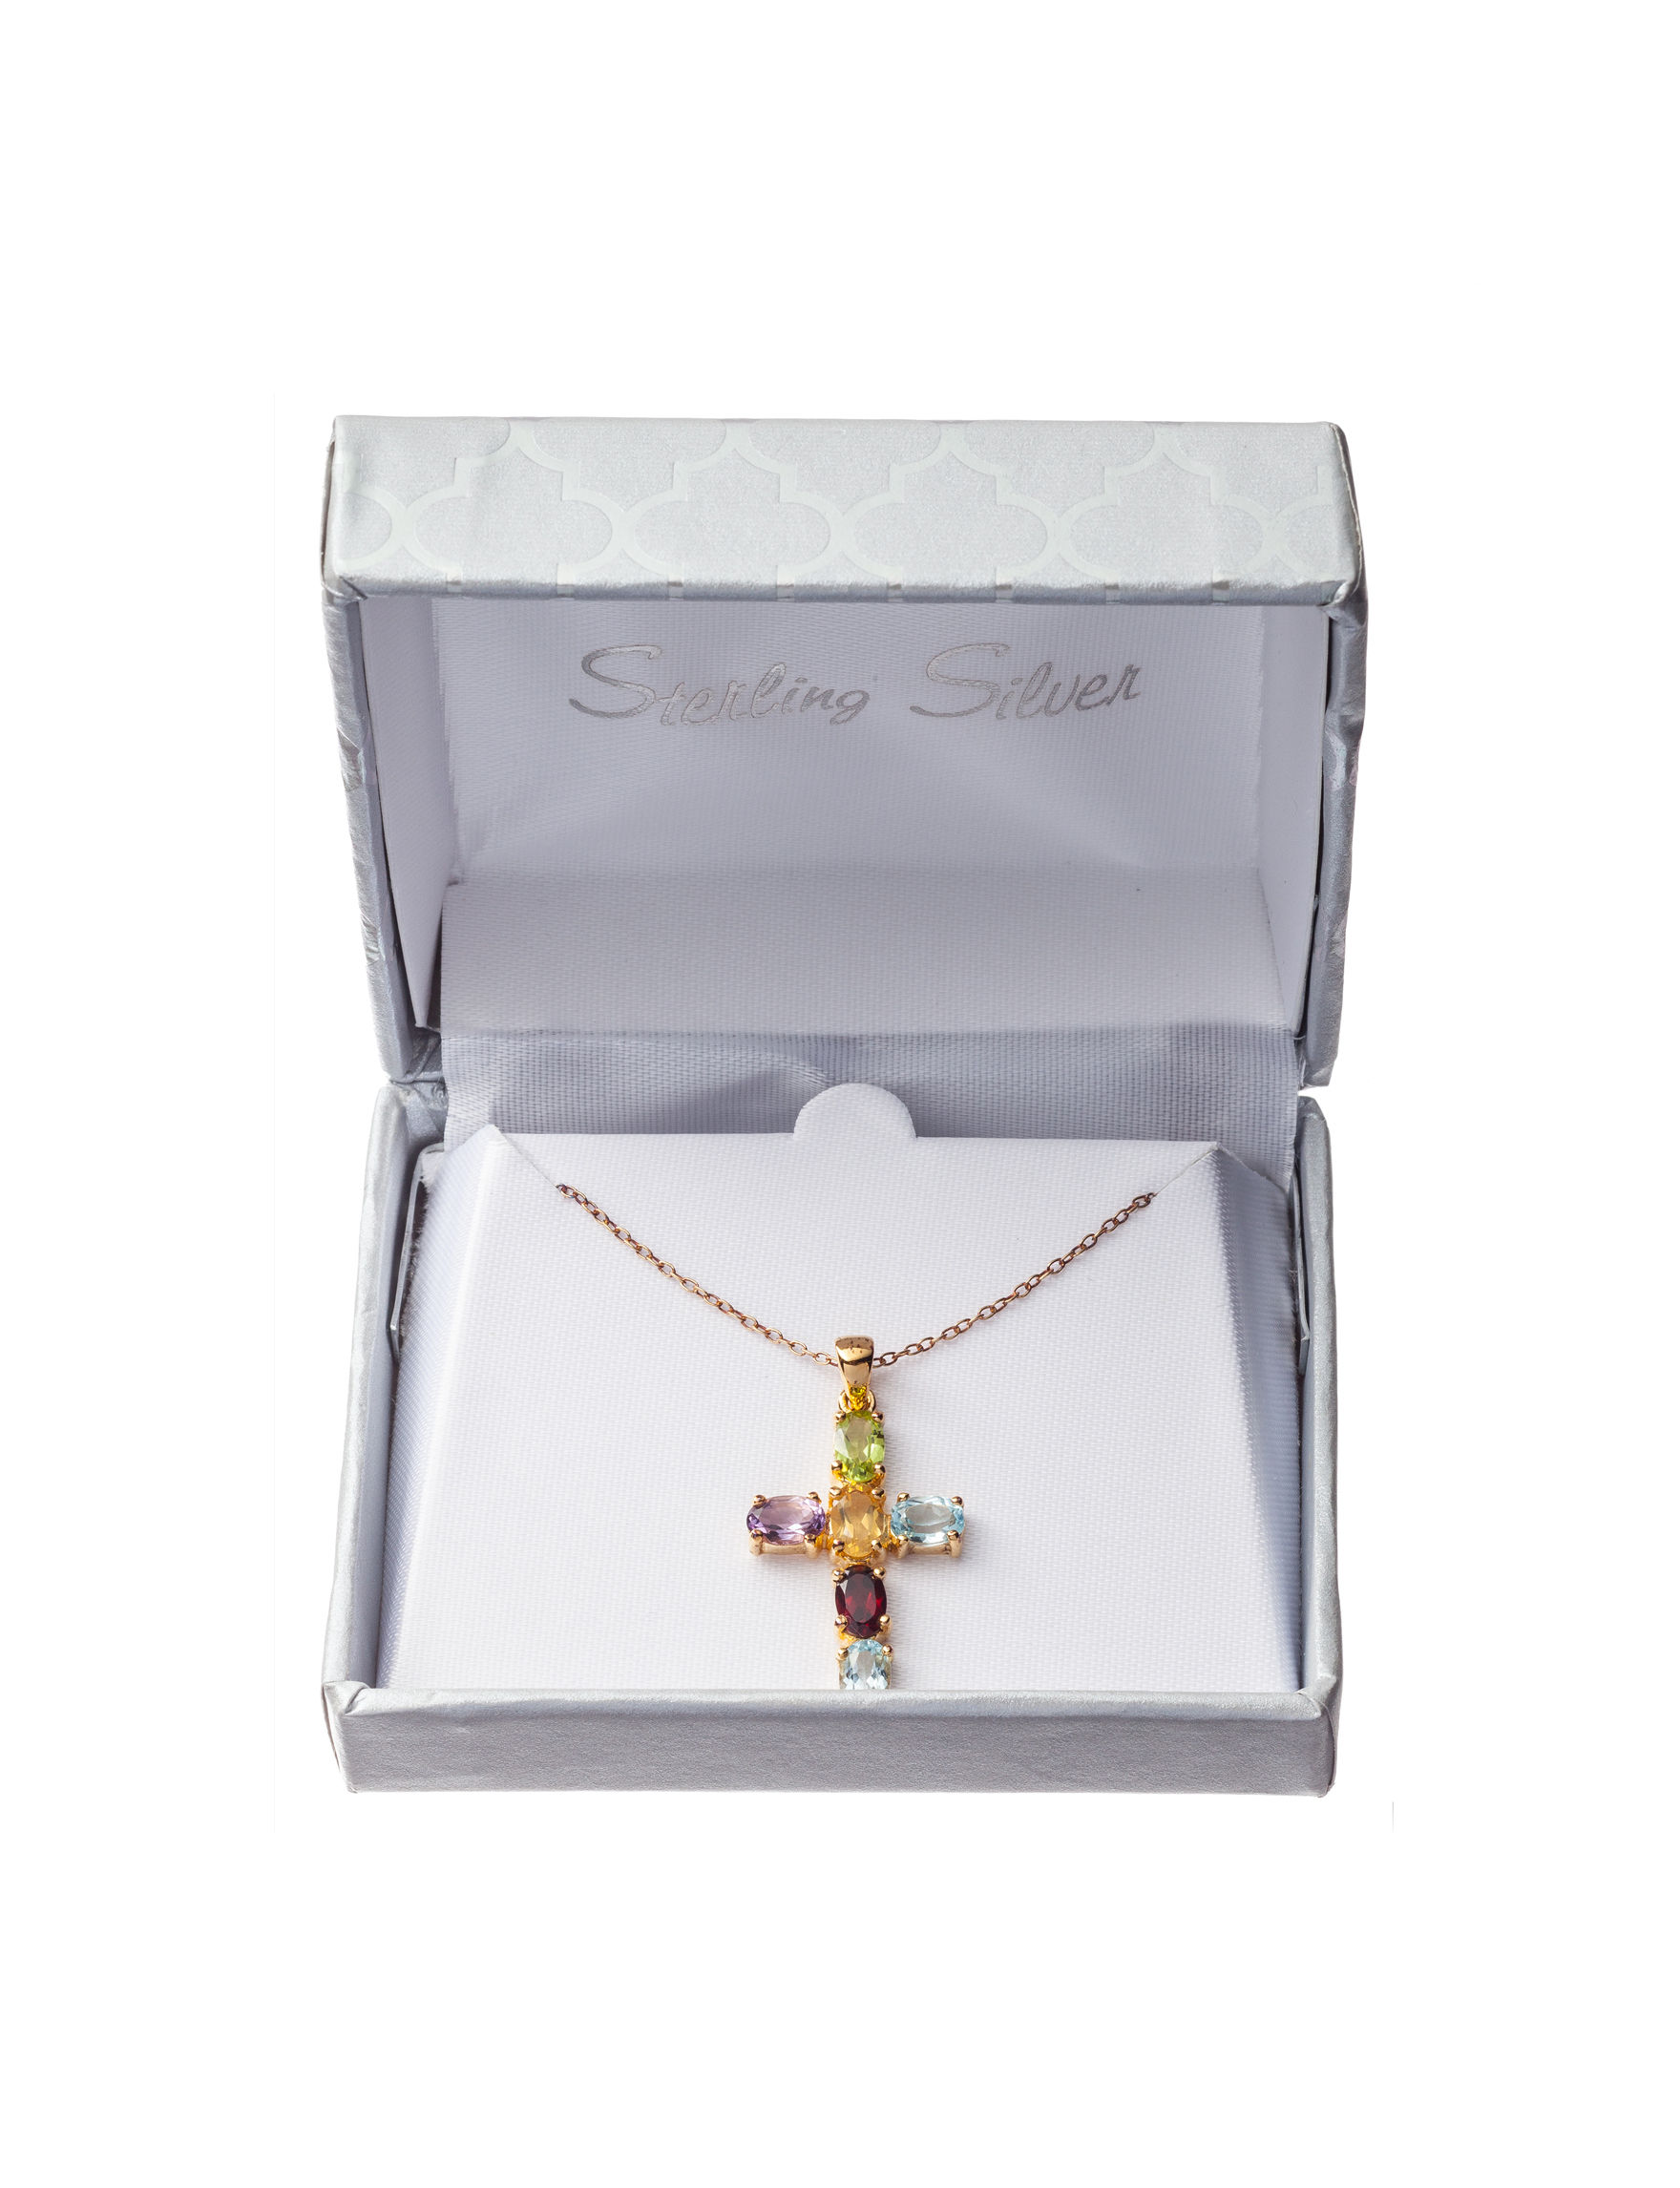 Marsala Gold Necklaces & Pendants Fine Jewelry